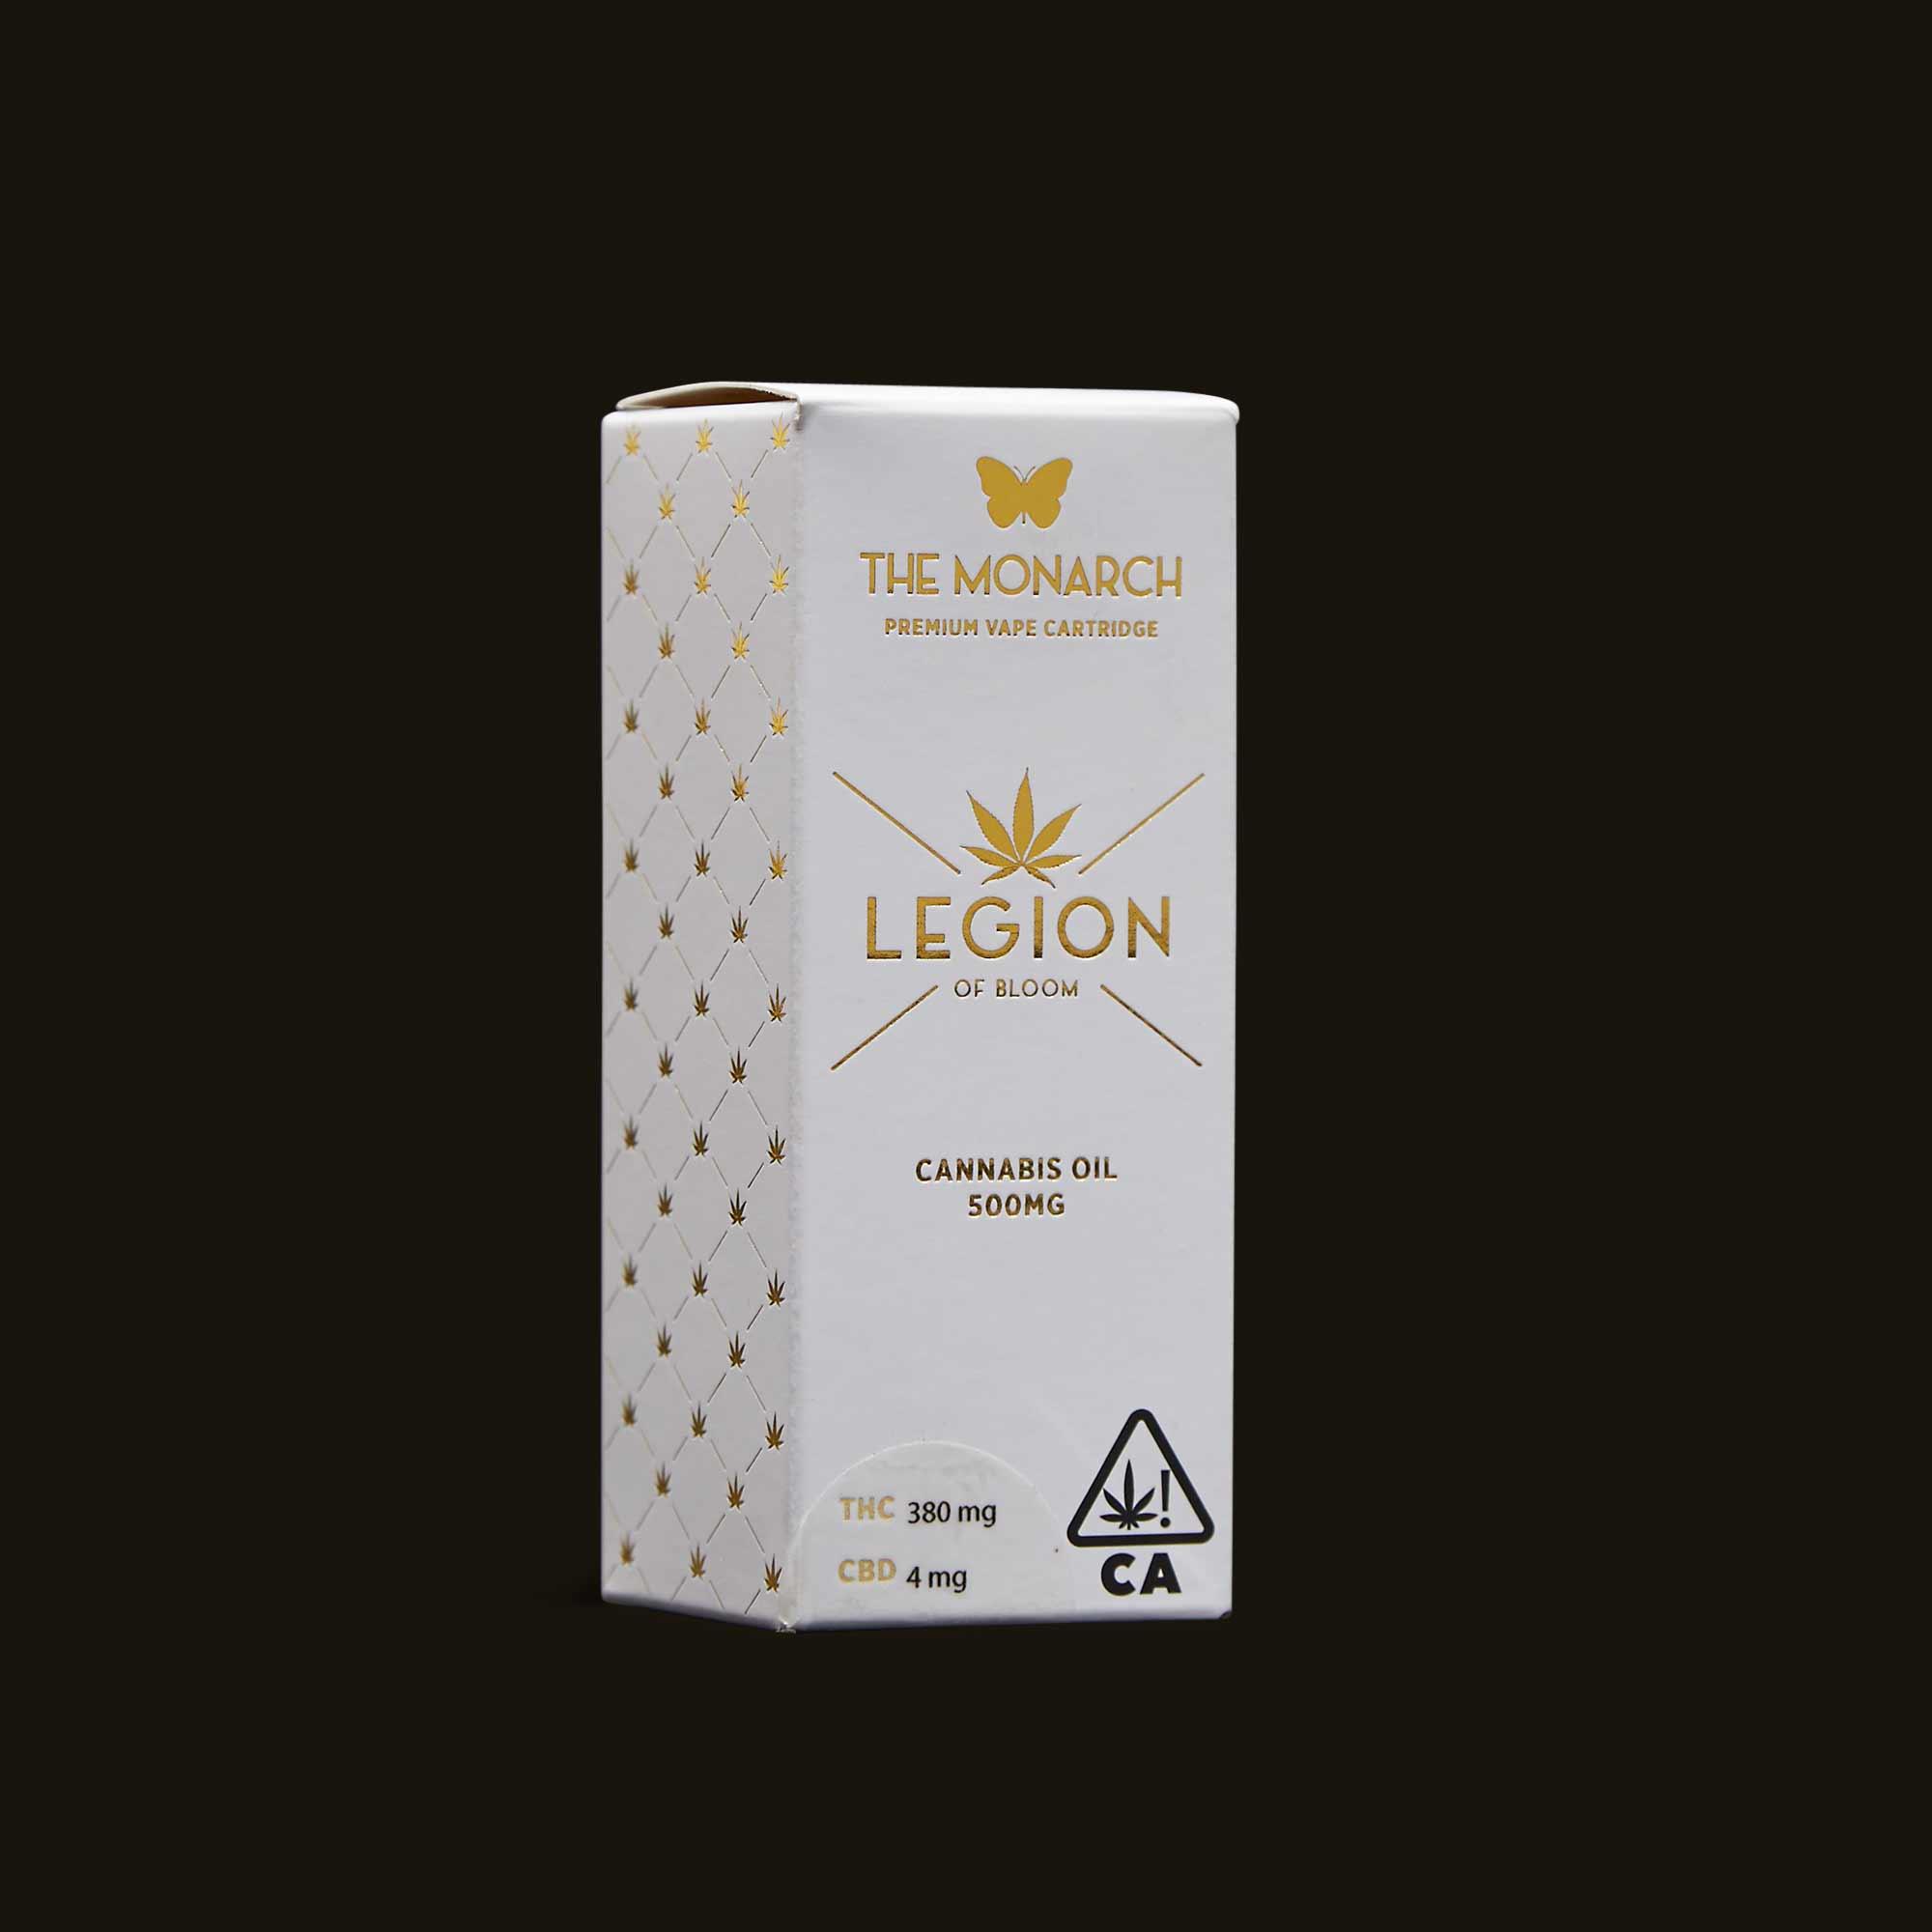 Legion of Bloom Kashmir Kush Monarch .5g